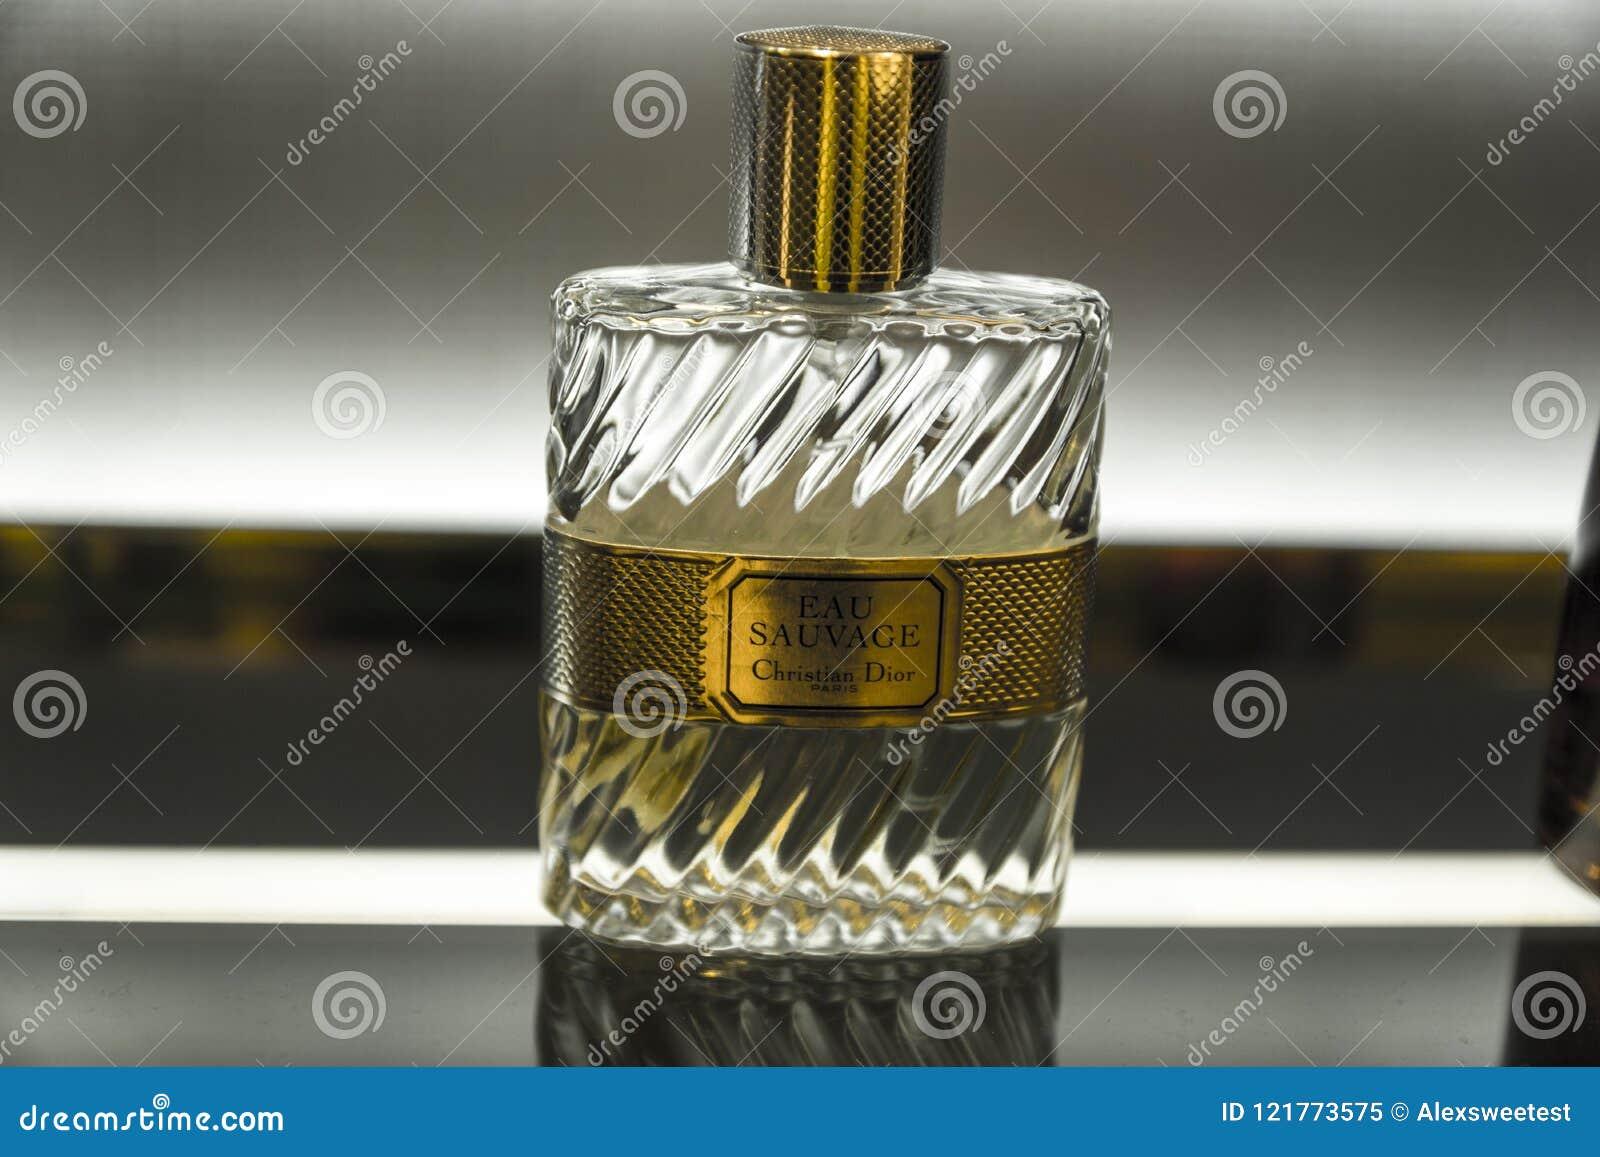 Christian Dior Eau Sauvage Perfume Editorial Image - Image